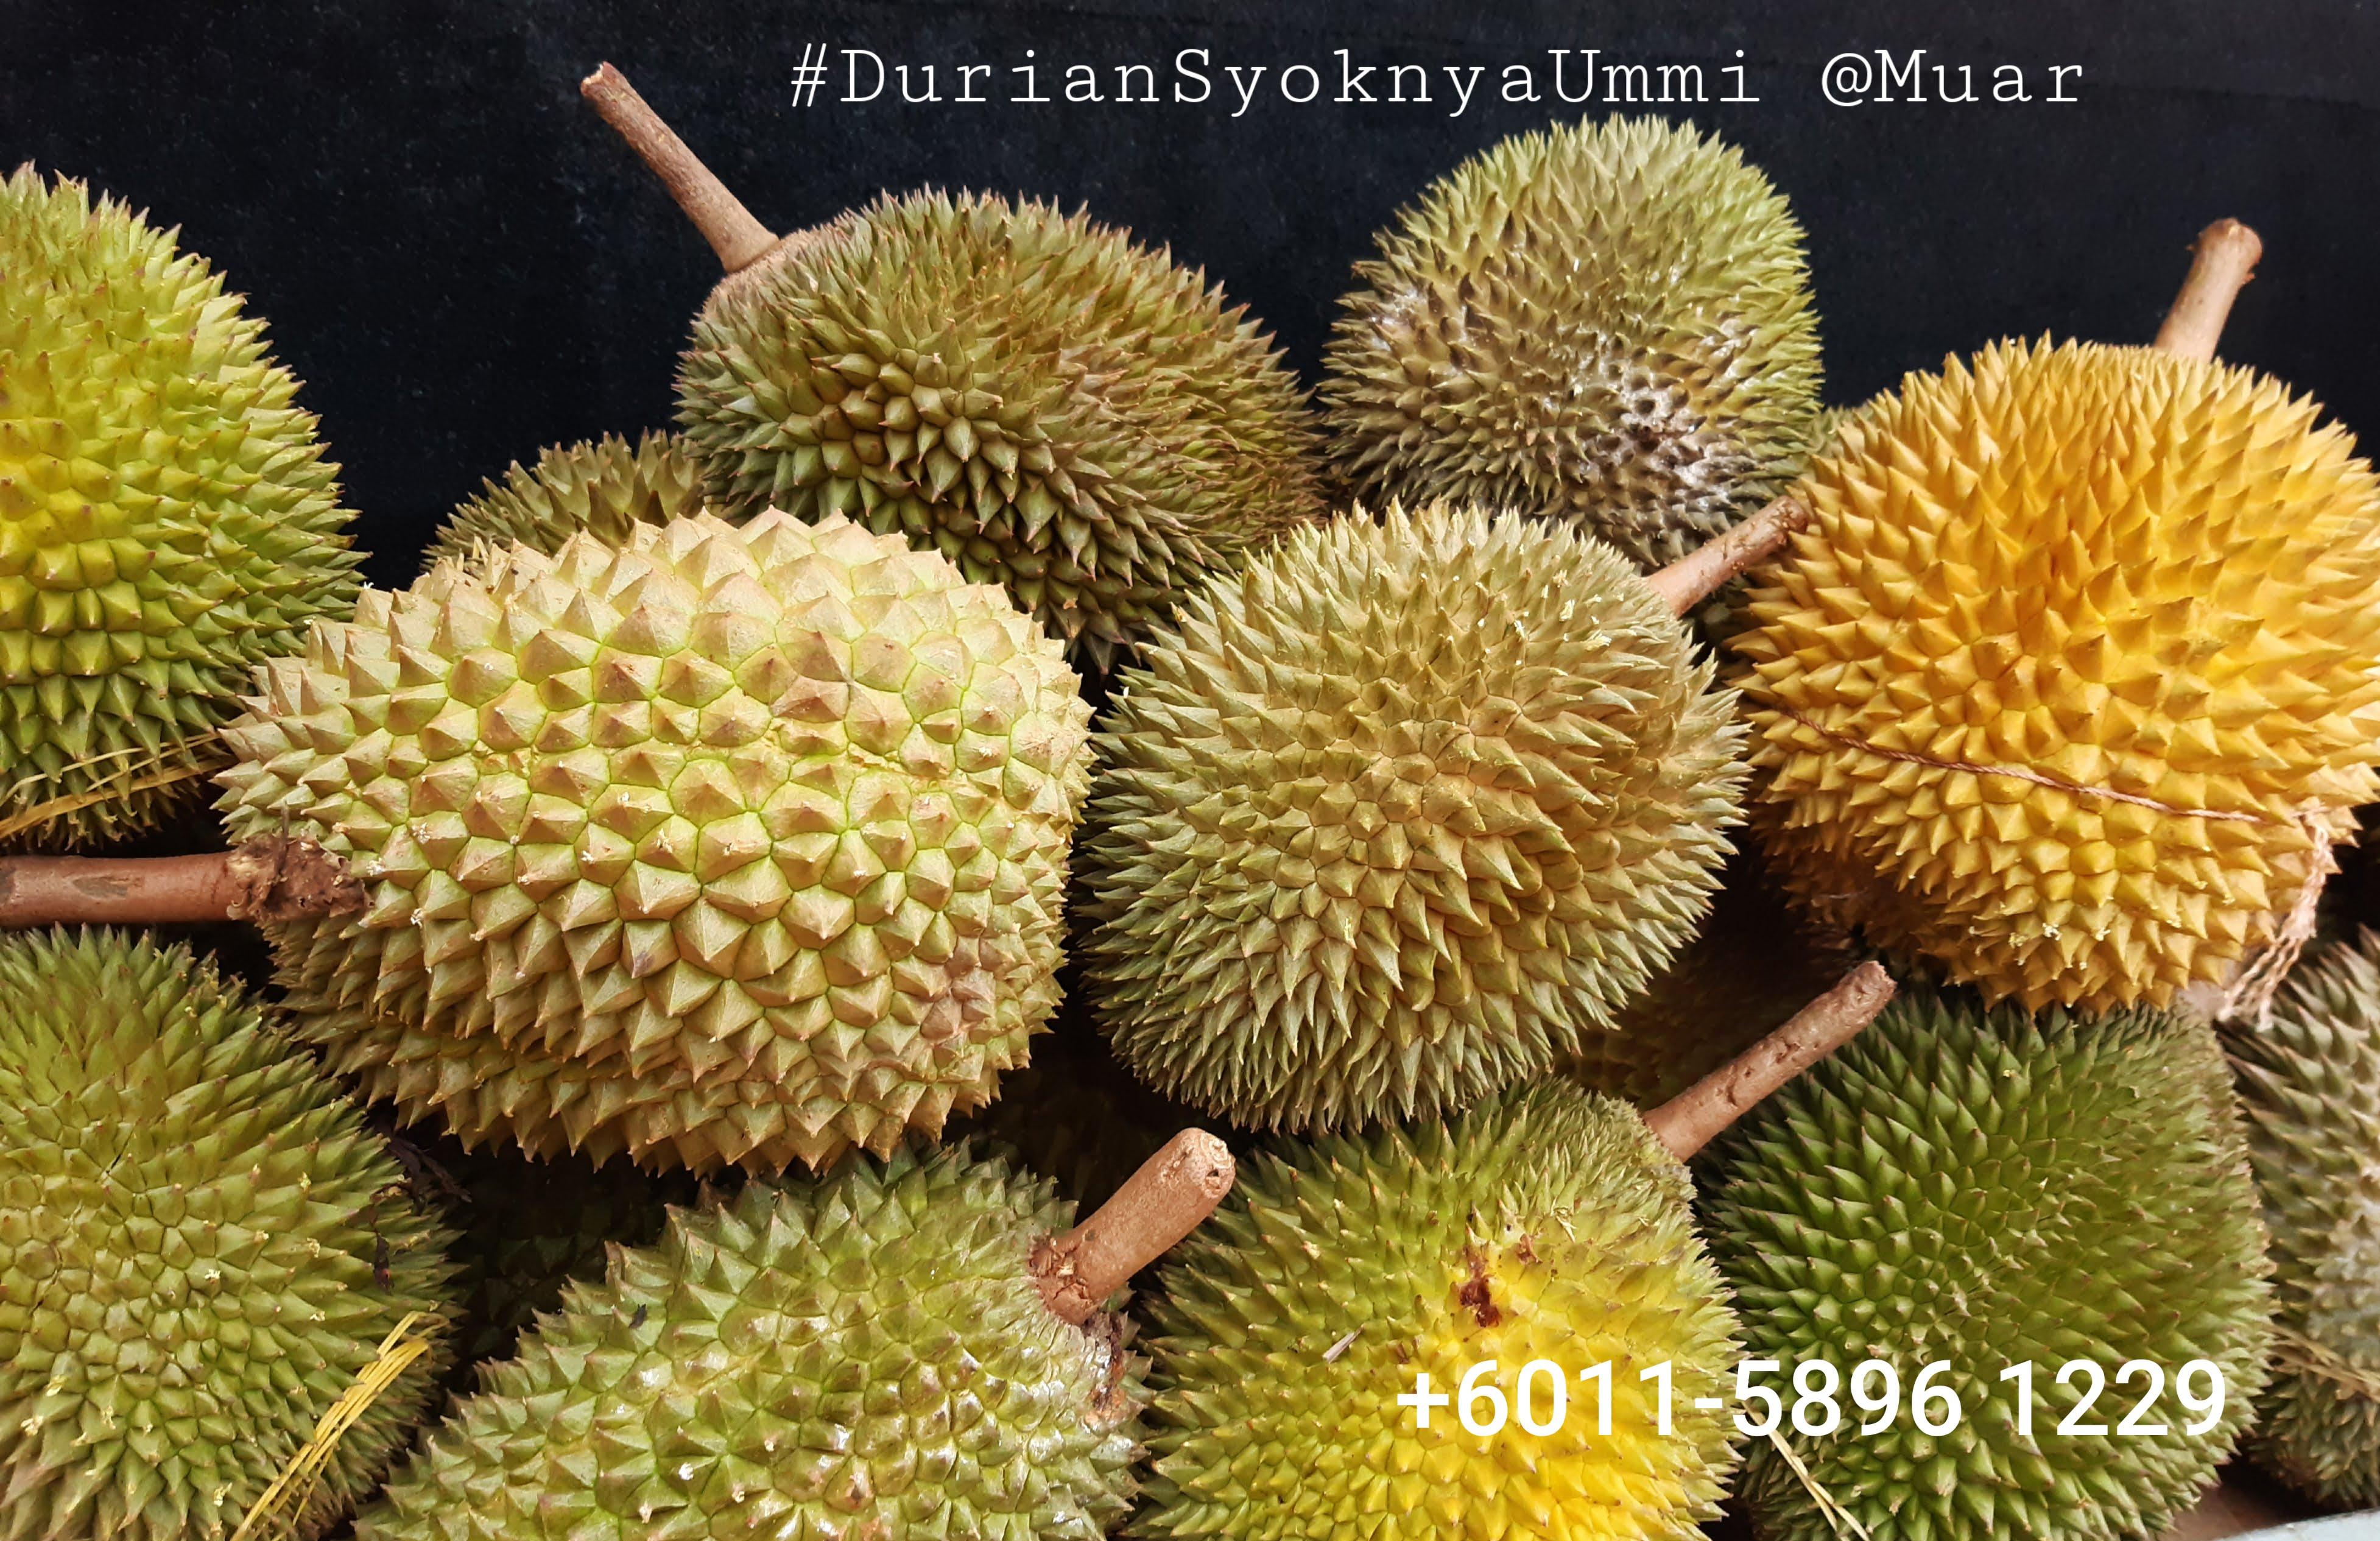 Pembekal durian muar 2019